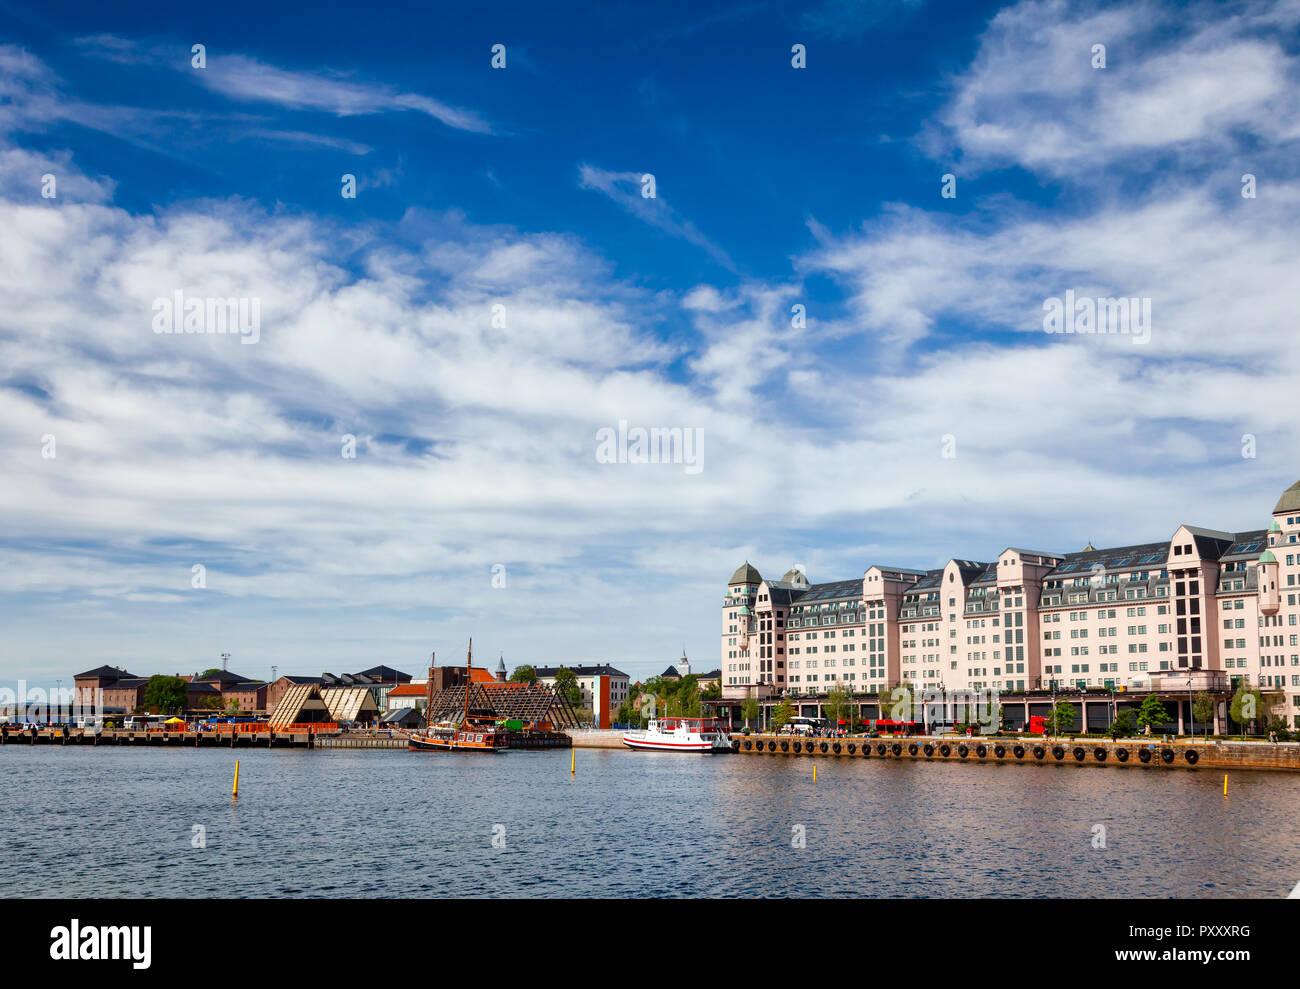 Bjorvika embankment  with Havnelageret building in Central Oslo Norway, Scandinavia - Stock Image